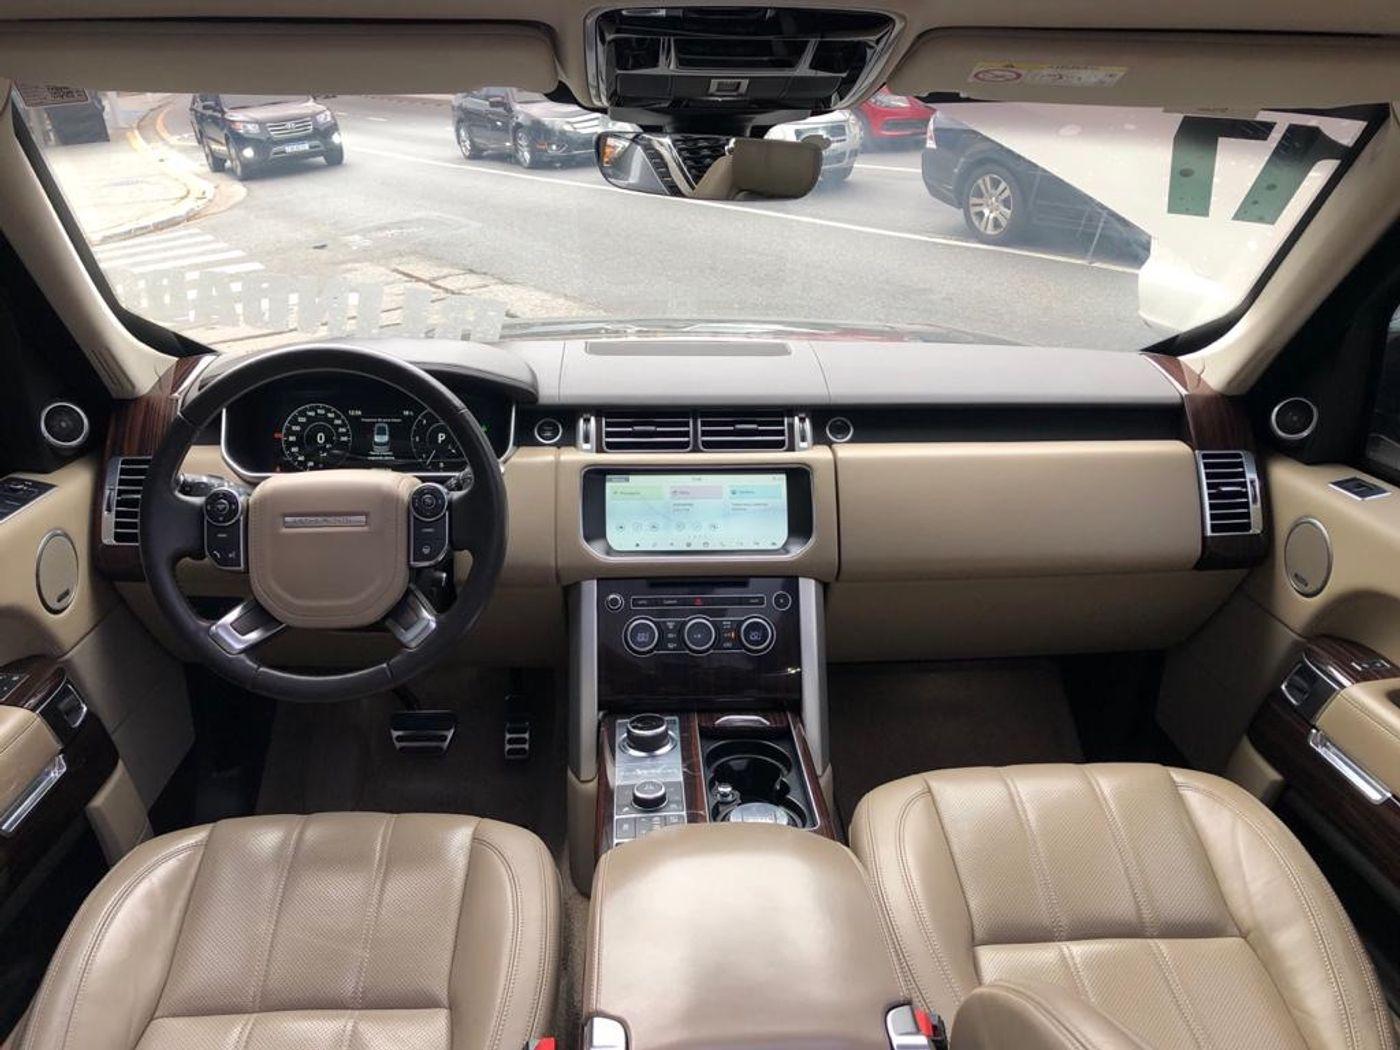 Land Rover Range Rover Vogue 3.0 TDV6 Diesel Aut.